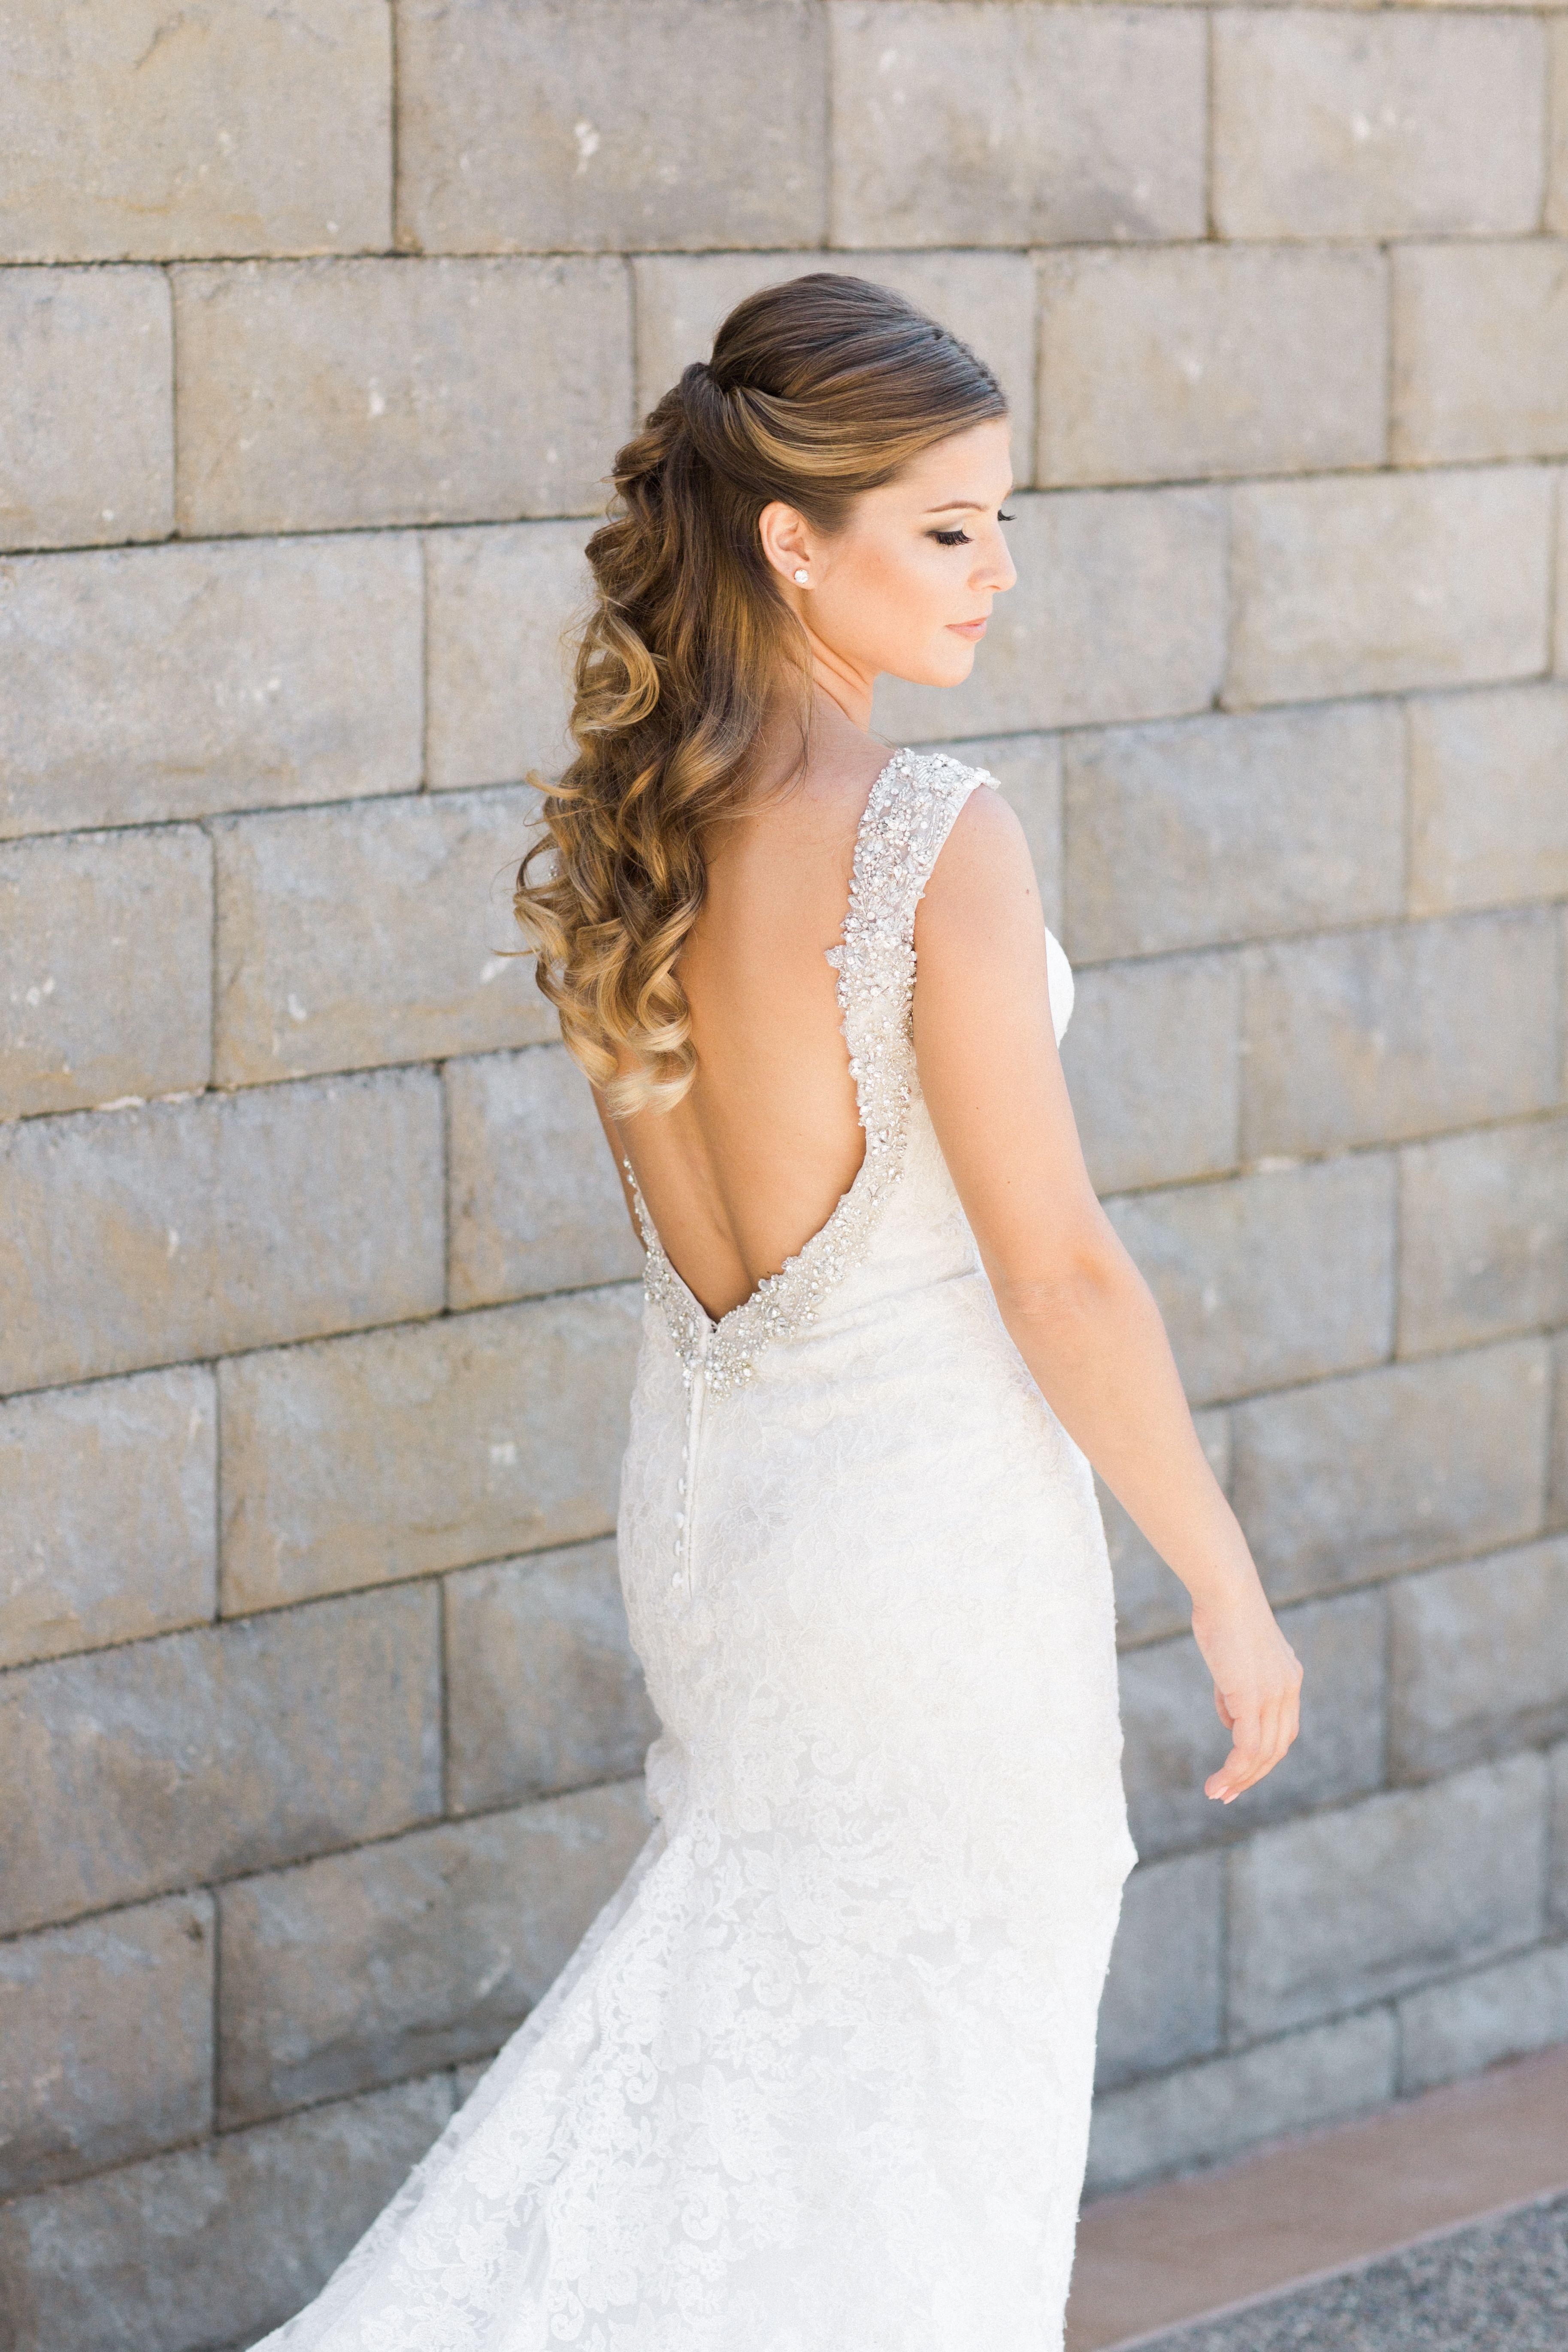 Half Up Bridal Hairstyle With Loose Curls bridal hair